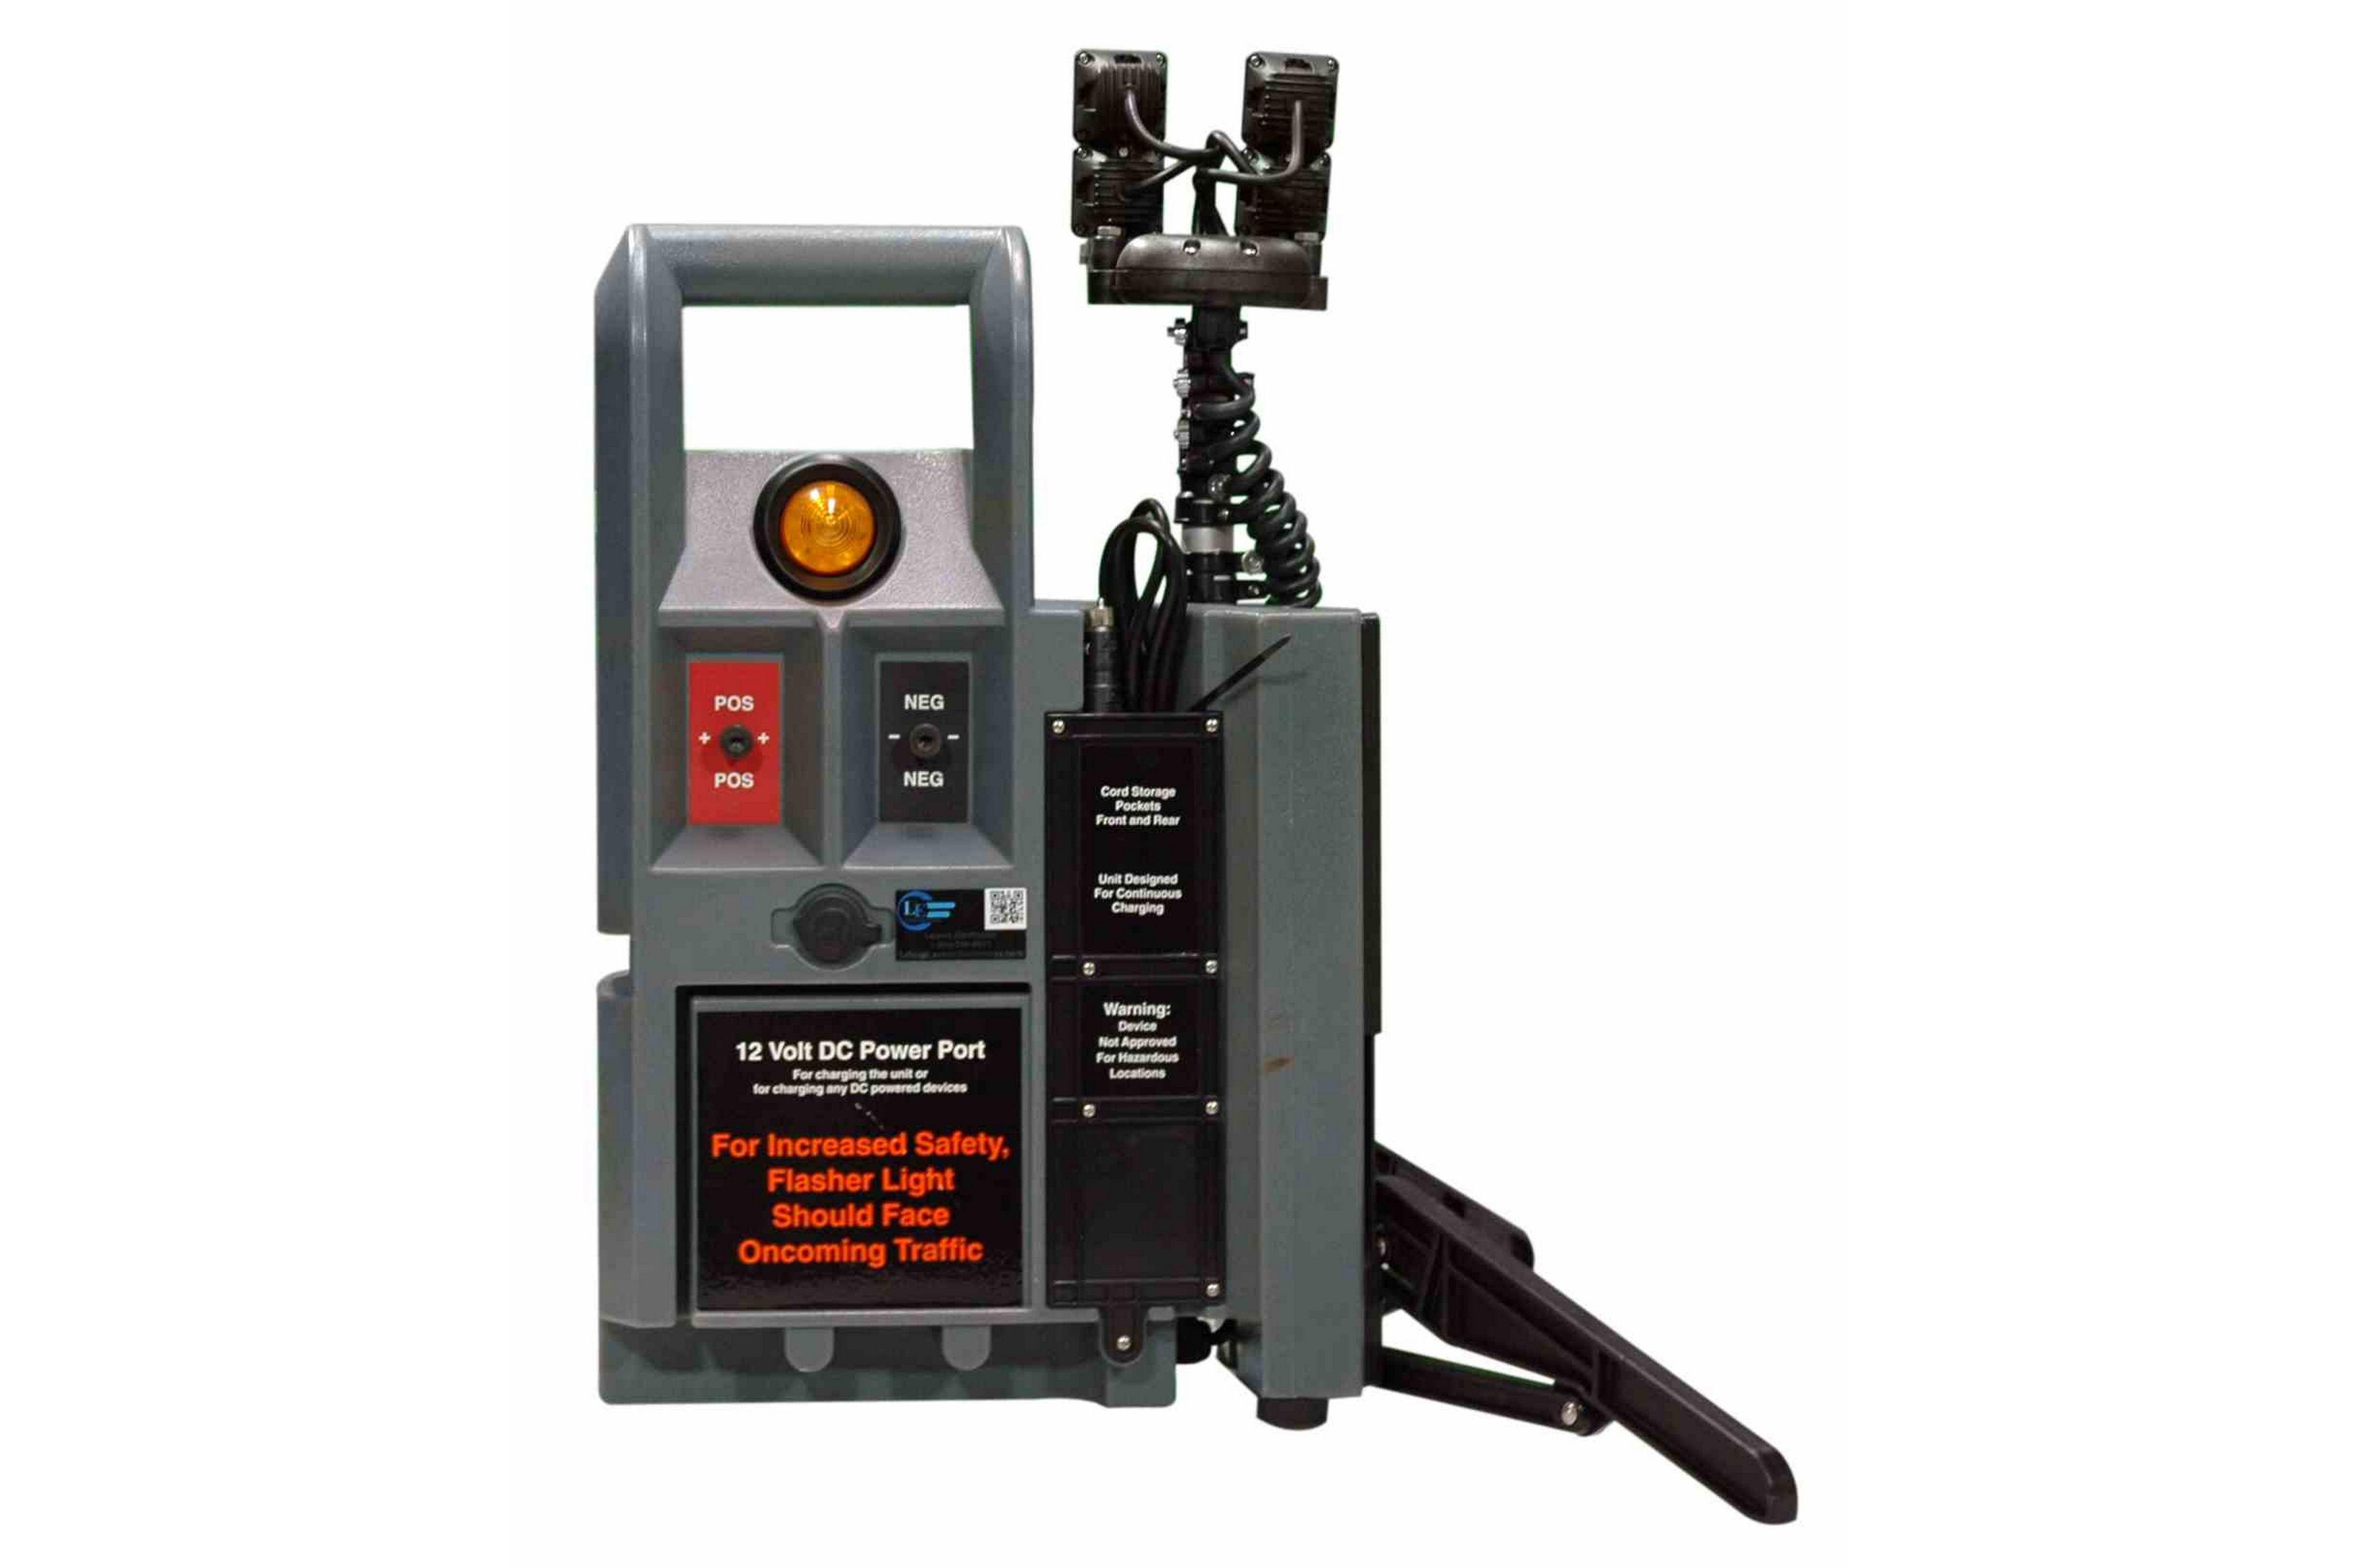 Portable Telescopic Light Tower: Portable LED Light Tower W/ Telescoping Light Heads